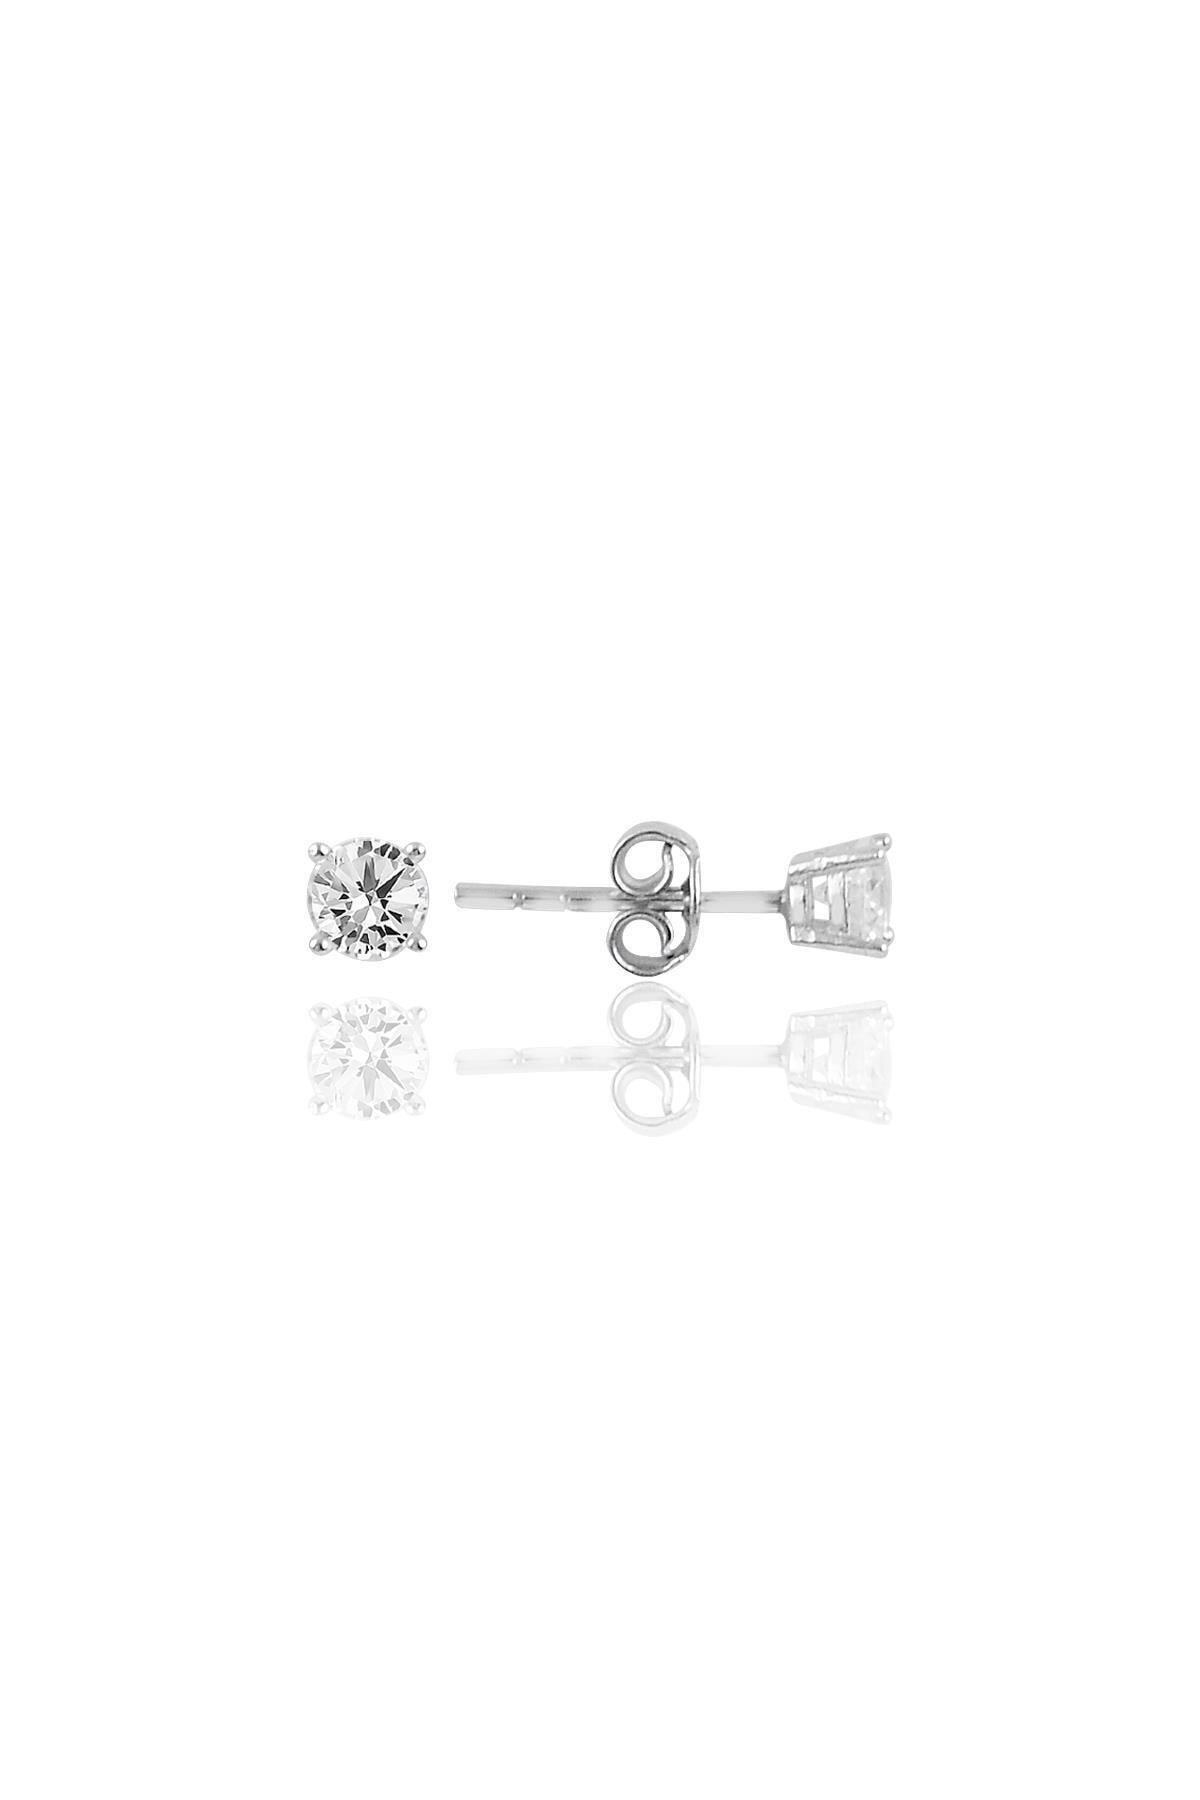 Söğütlü Silver Gümüş Pırlanta Montürlü Rodyumlu Tek Taş Küpe 1